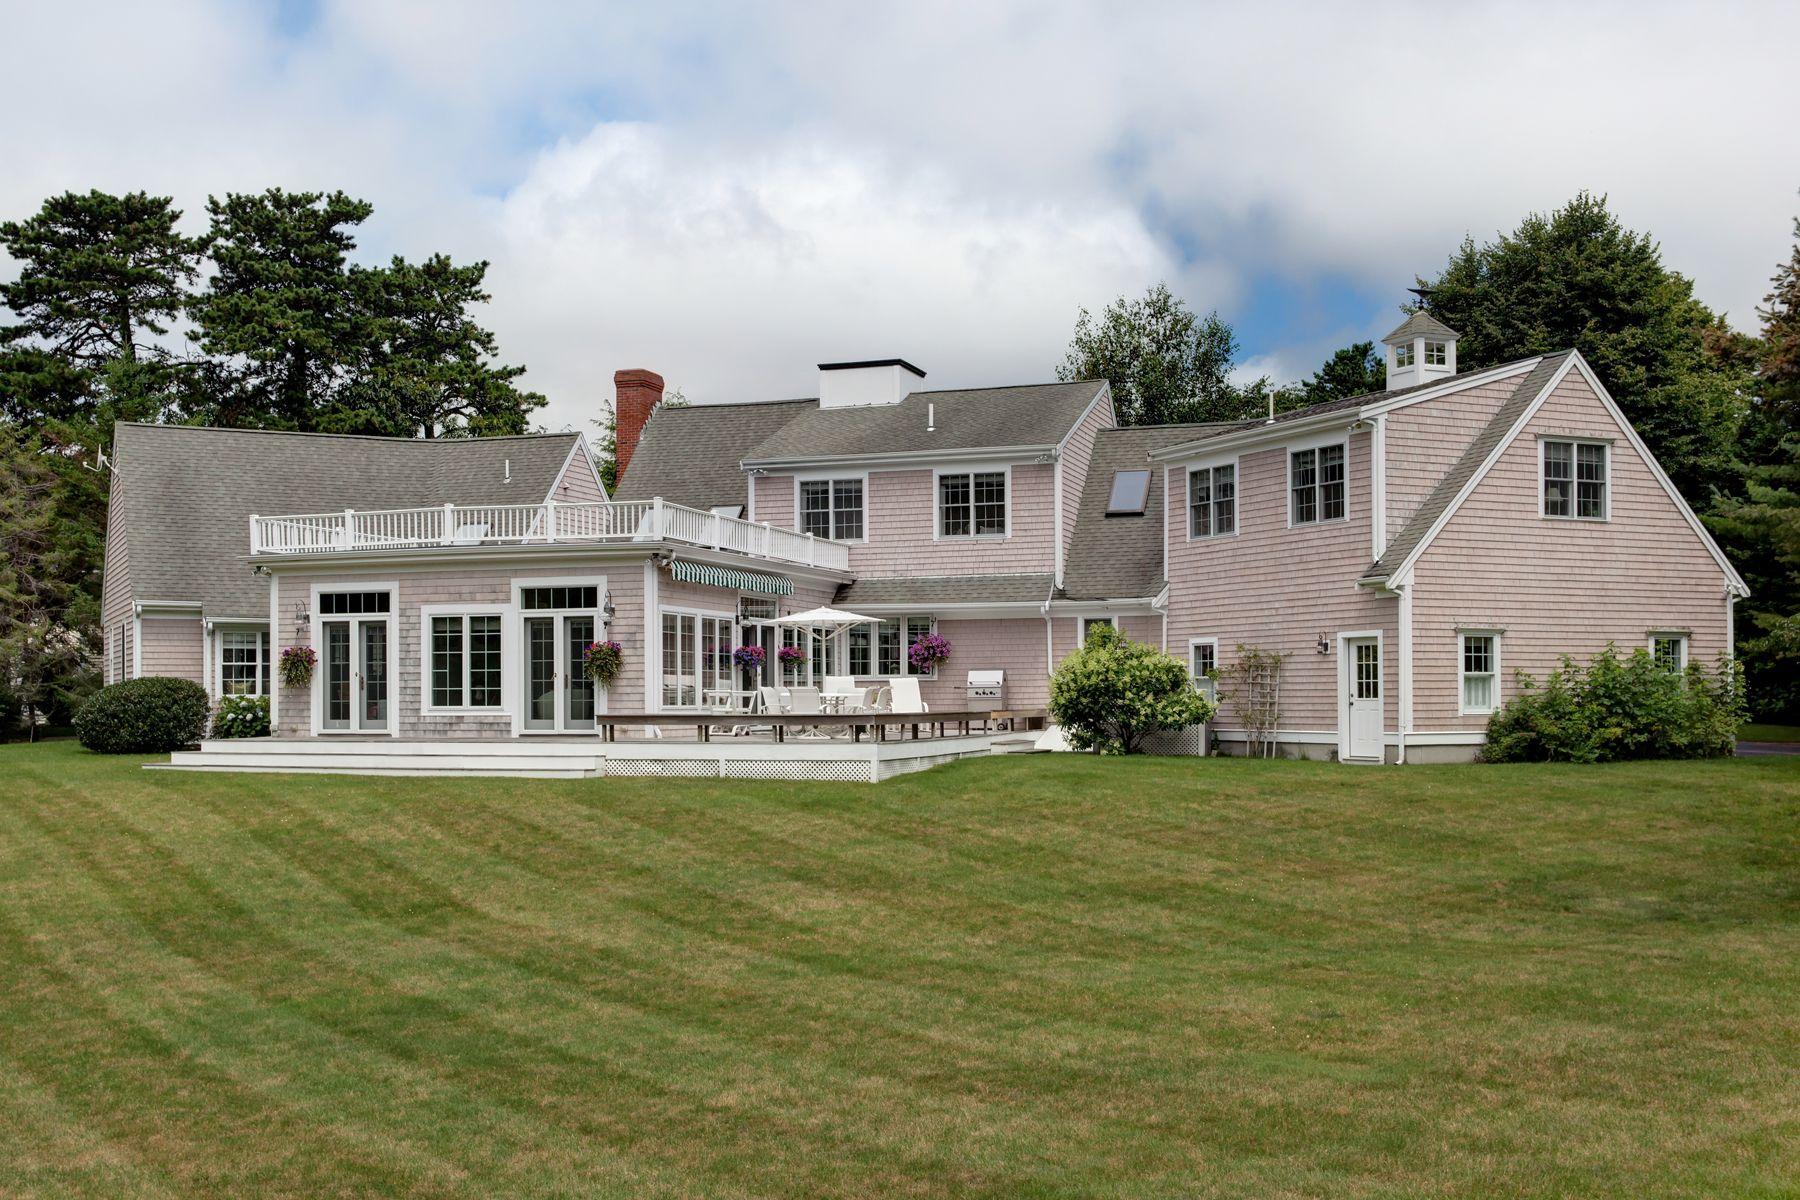 Single Family Homes για την Πώληση στο 47 Farm Valley Rd, Osterville, MA Osterville, Μασαχουσετη 02655 Ηνωμένες Πολιτείες